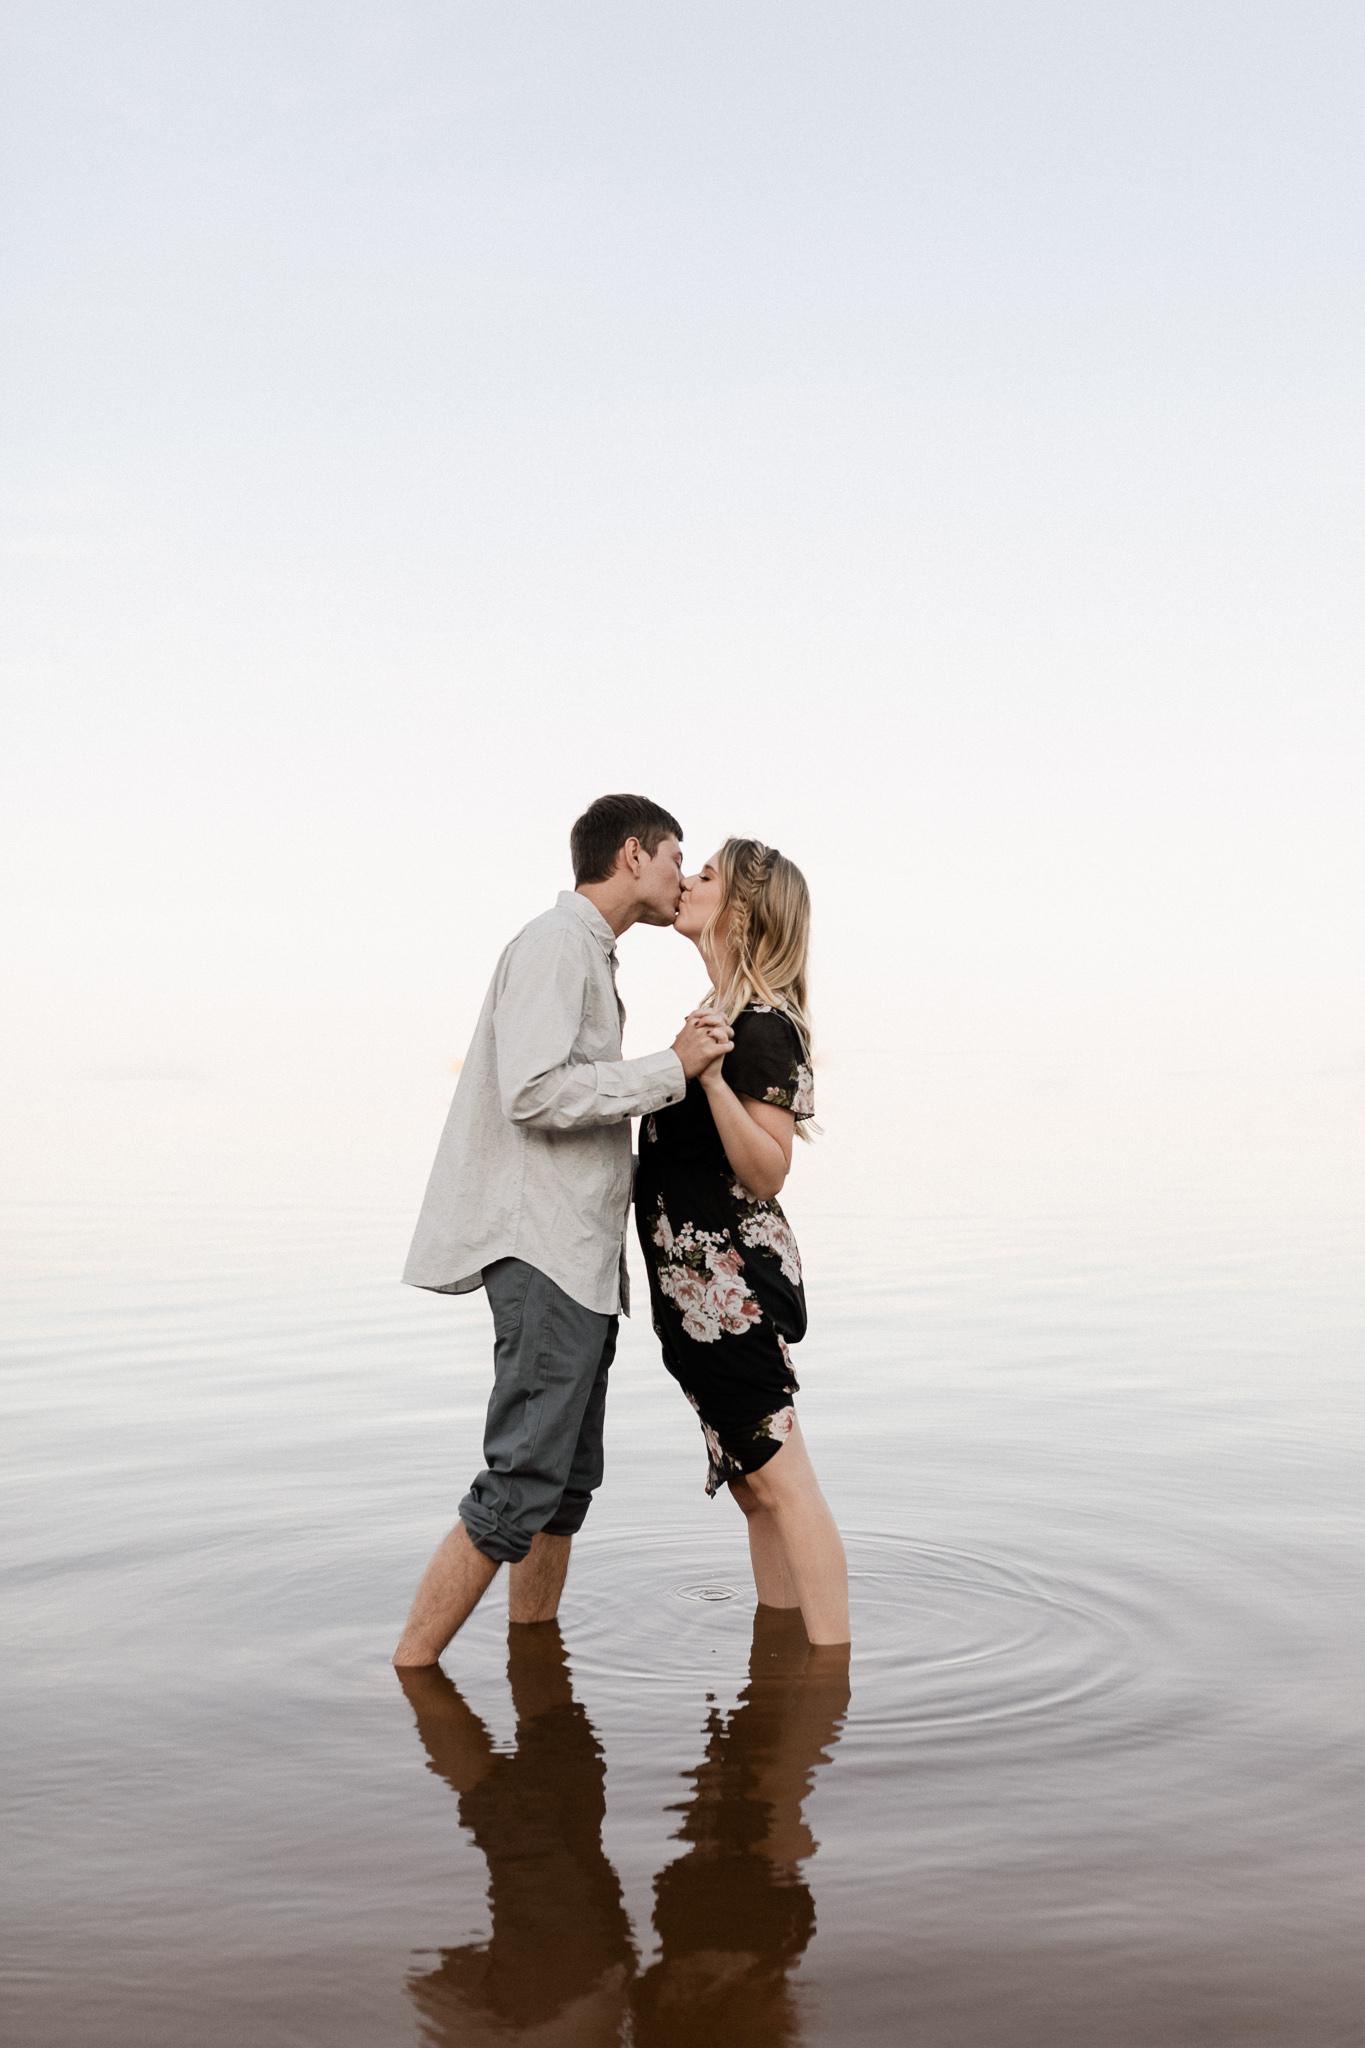 Kyle + Brittany | Fall Lake Engagement Photos | Oklahoma Lifestyle Photographer-21.jpg